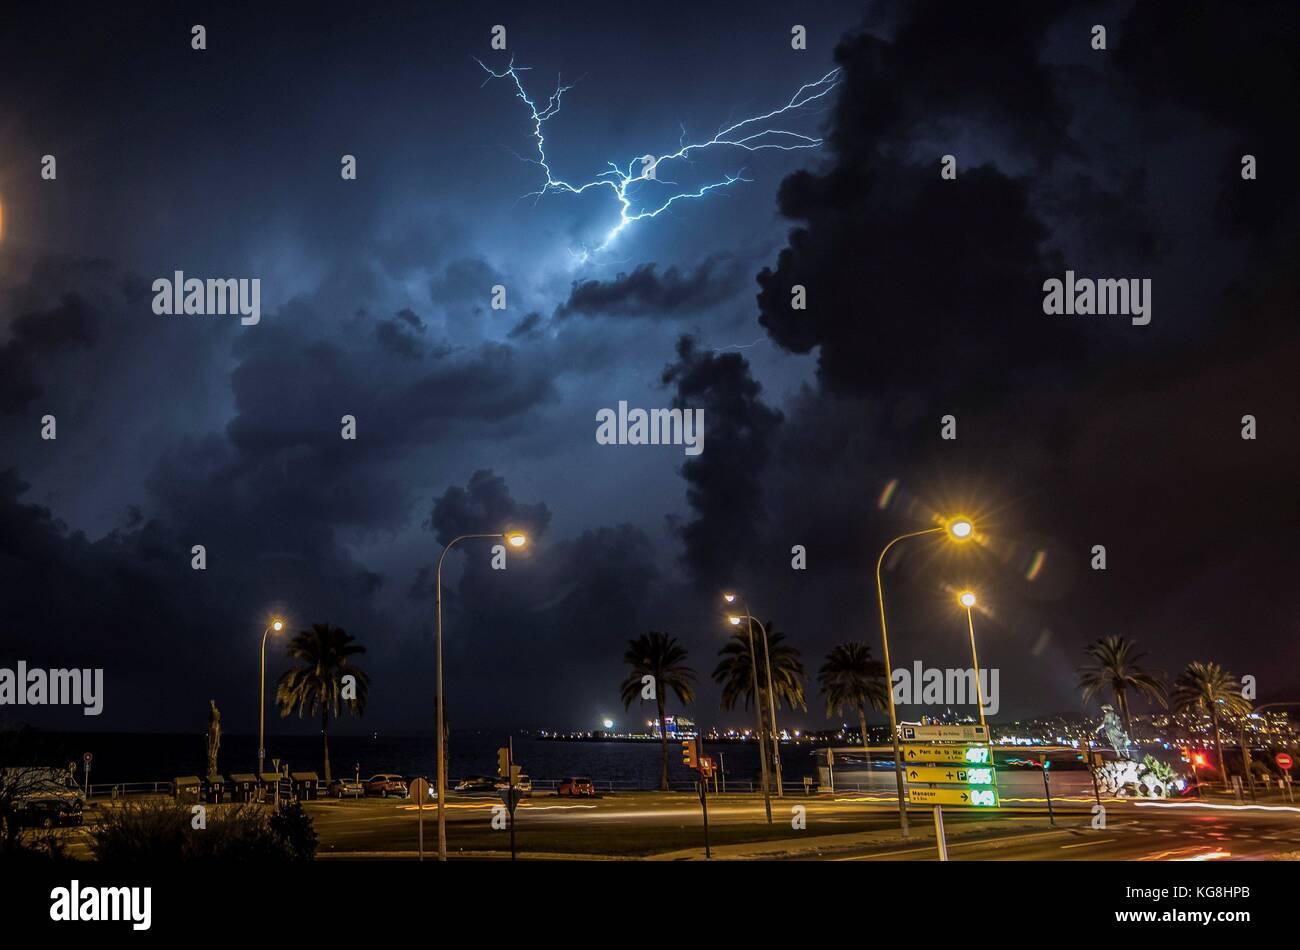 Palma De Mallorca, Spain. 05th Nov, 2017. General view of a storm in the promenade of Palma de Mallorca, Balearics, Stock Photo